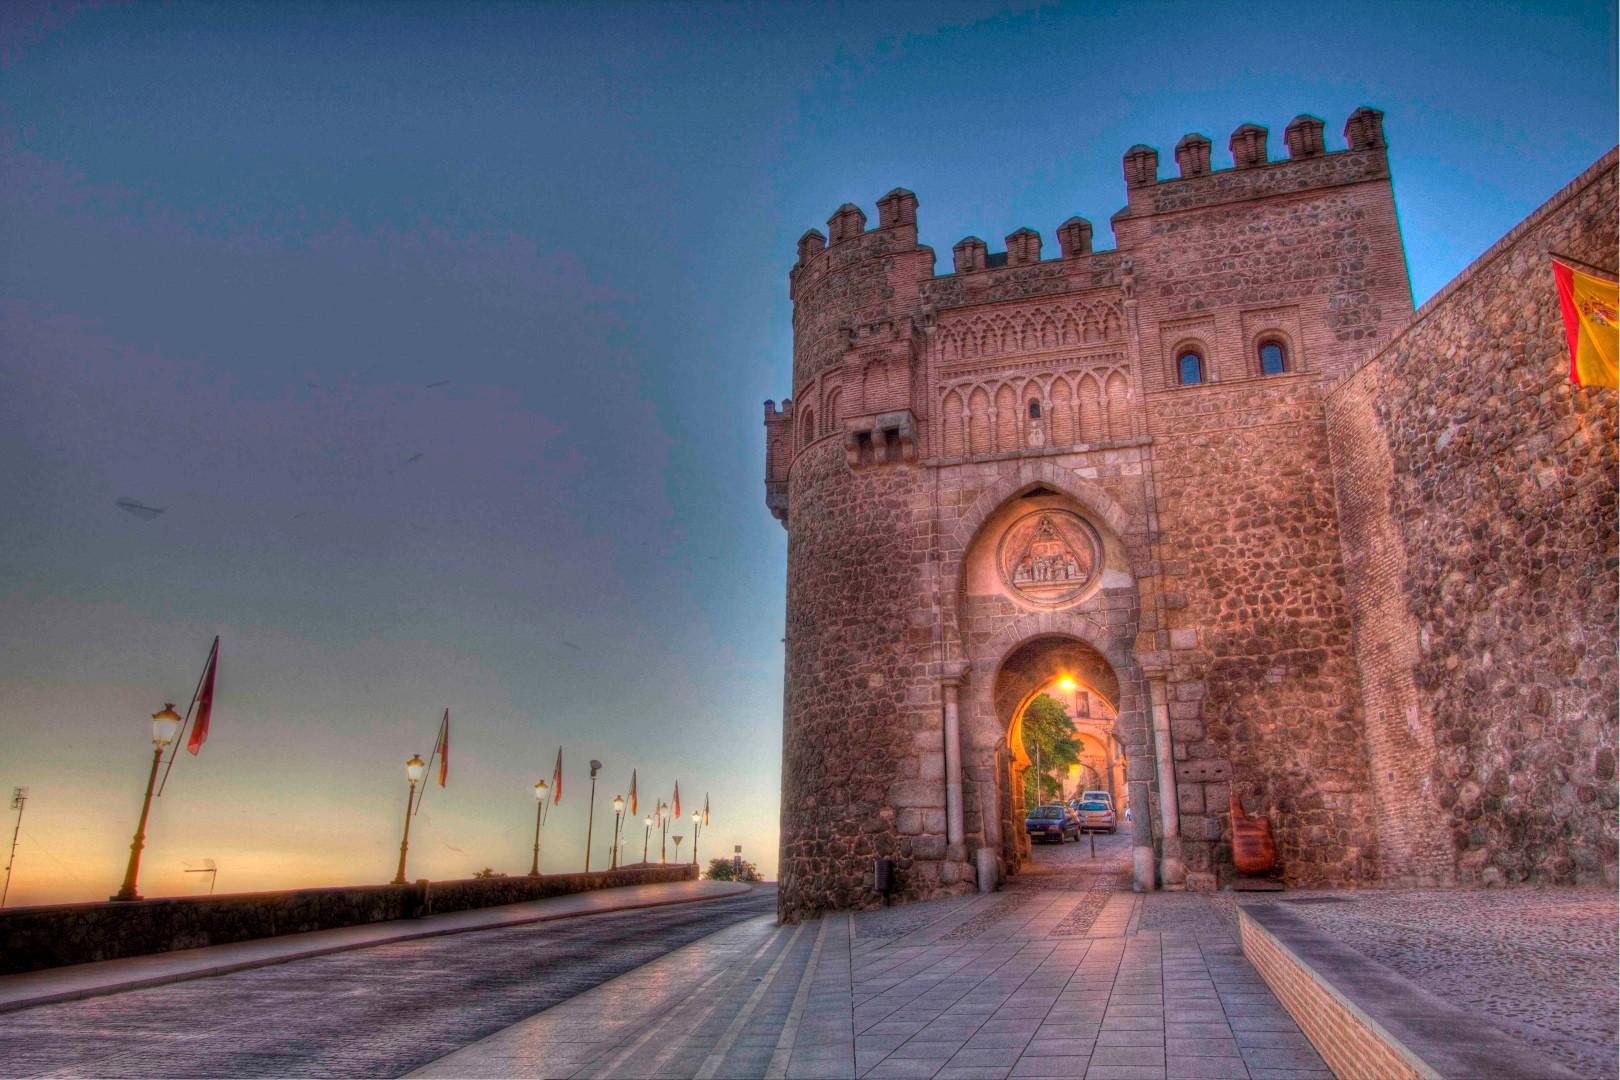 Travelers Roundtable, Toledo, Puerto del Sol gate, Robert Bundy, Visigoth